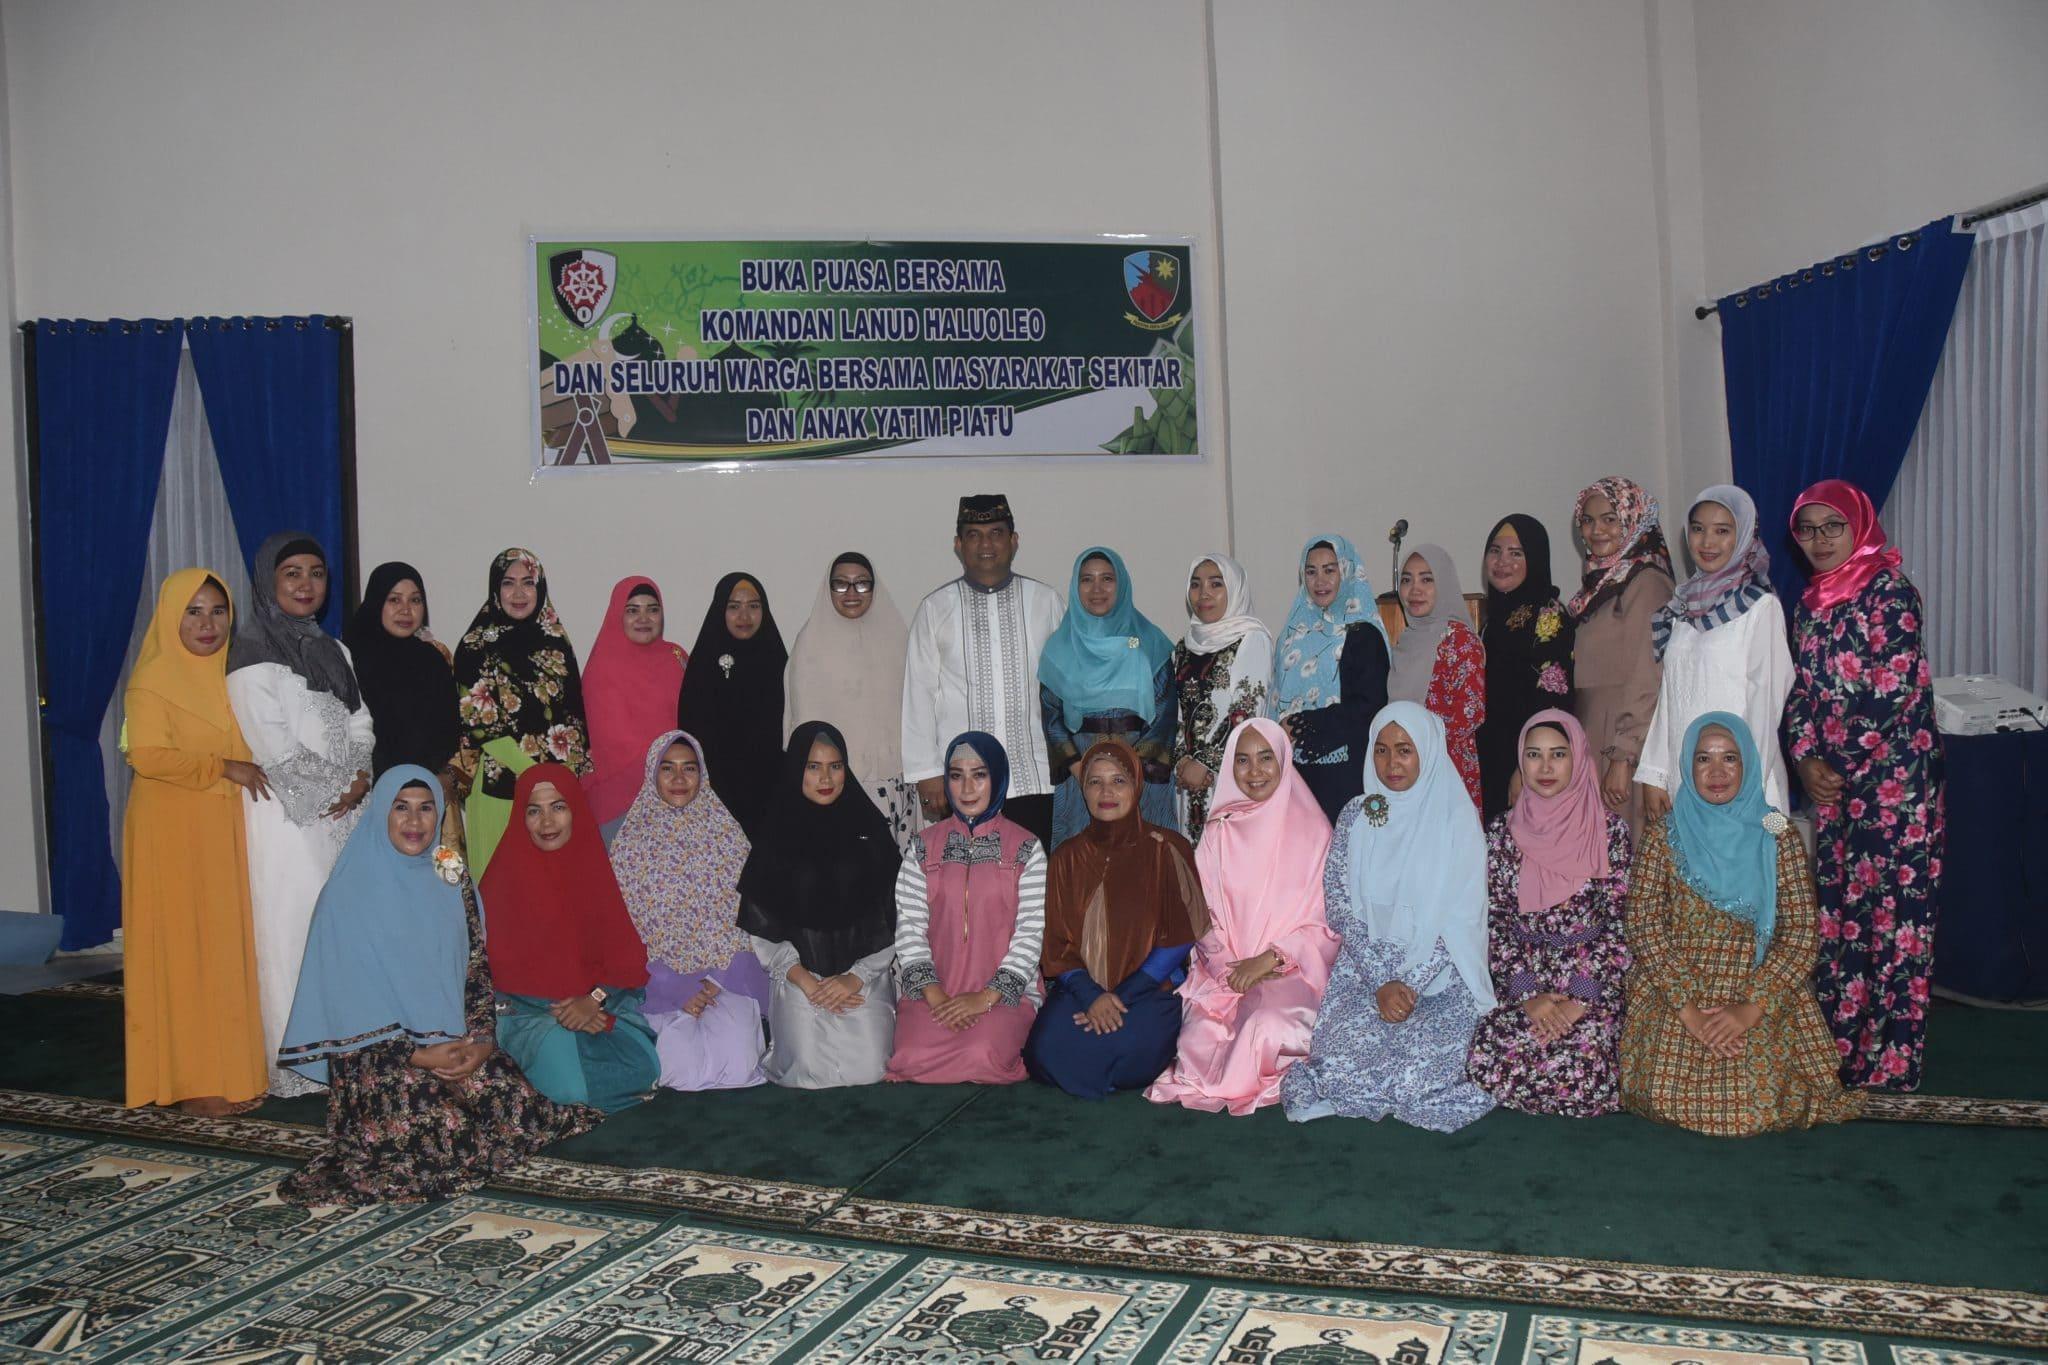 Buka Bersama Komandan Lanud Haluoleo dan Seluruh Warga bersama Masyarakat sekitar dan anak Yatim Piatu